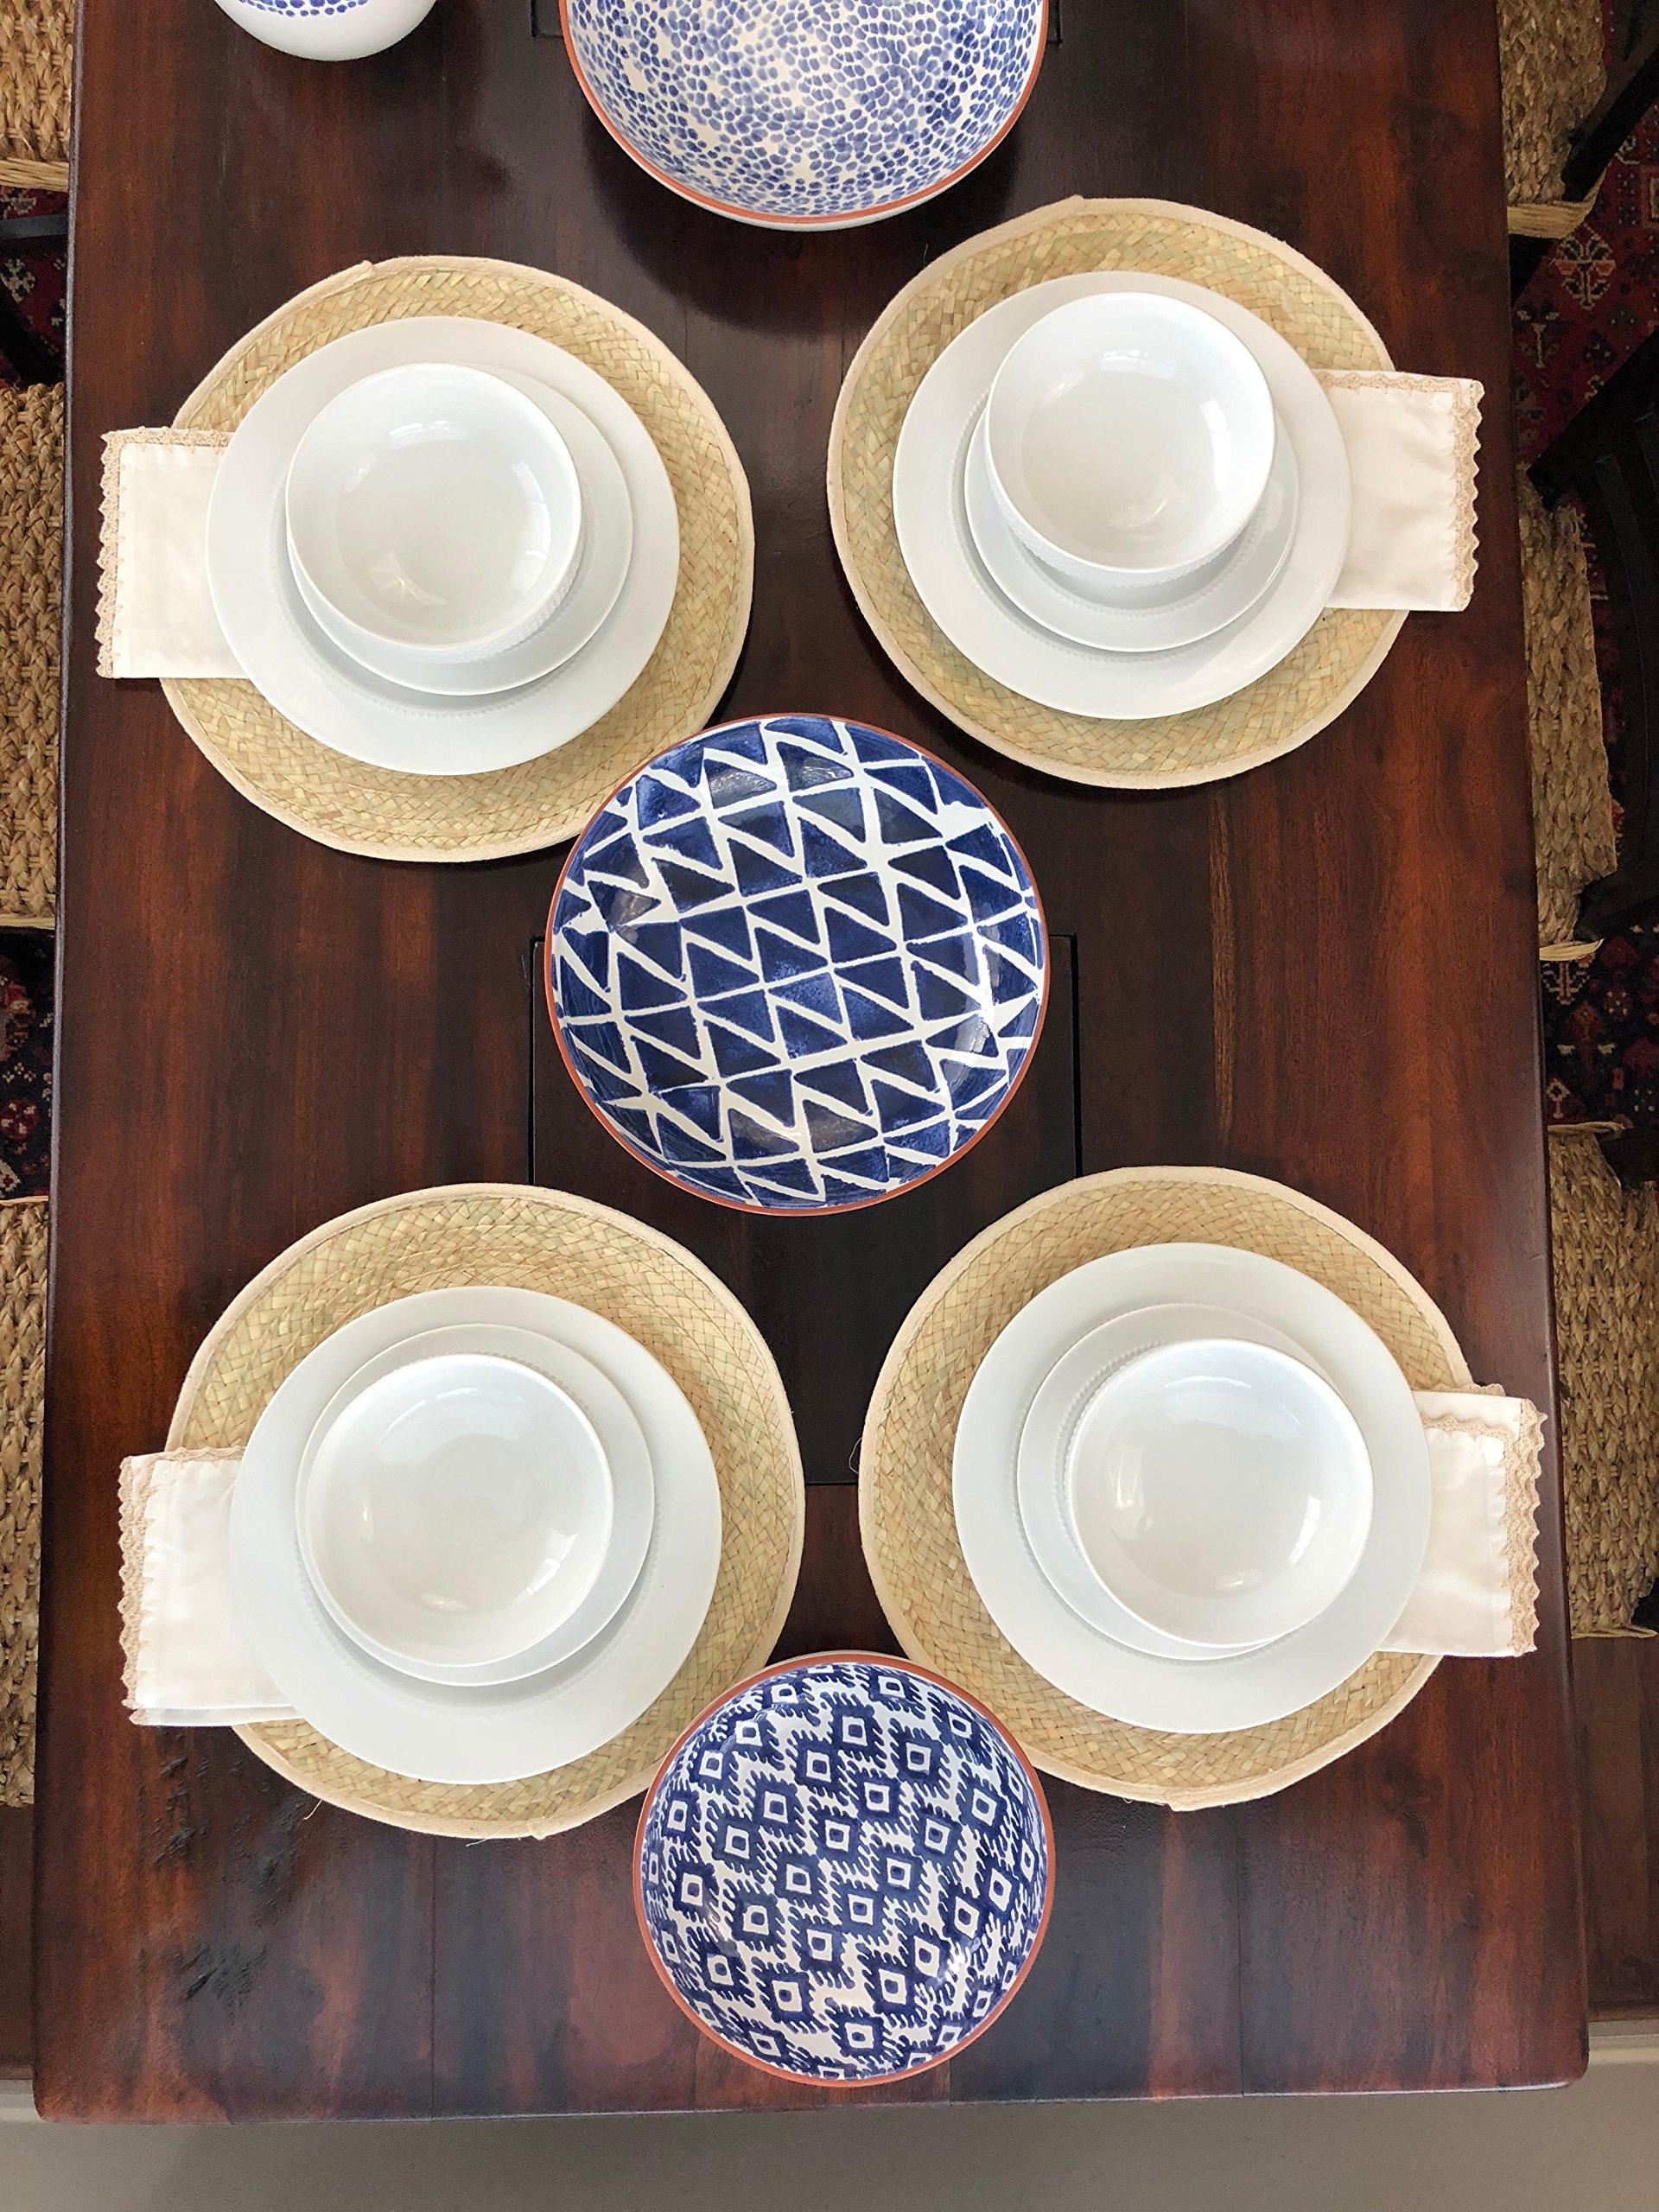 MoLi 100% Egyptian Cotton Cloth Dinner Napkins Hand Crocheted - Set of 6 Pack Lunch Linen - Elegant Decorative Fabric Handmade Table Linens - Servilletas de Tela Wedding Napkin (White) by MoLi (Image #4)